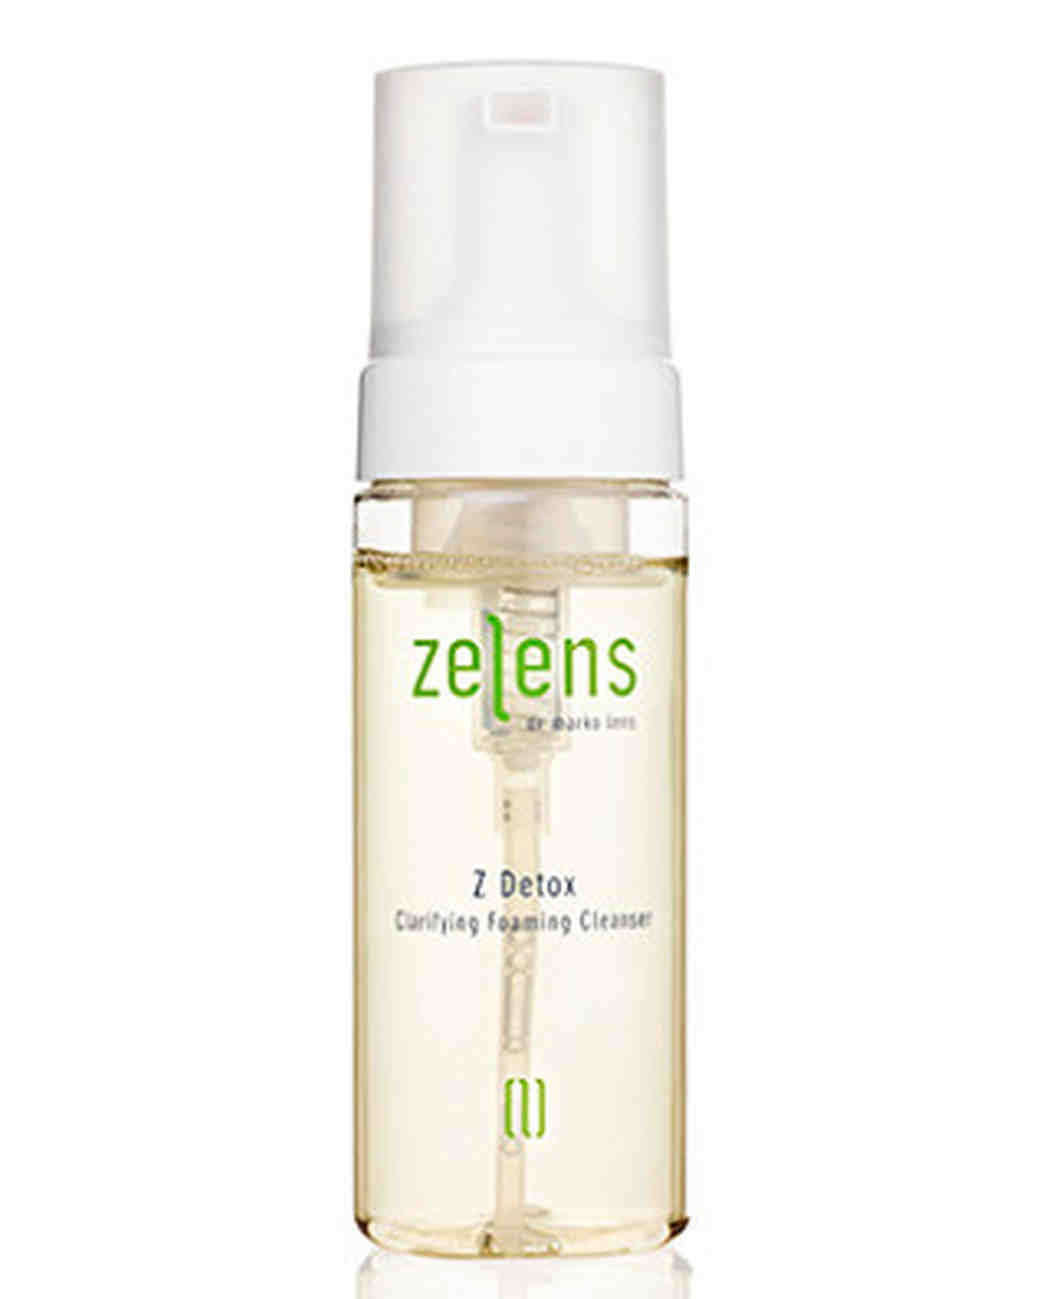 zelens z detox clarifying foaming cleanser